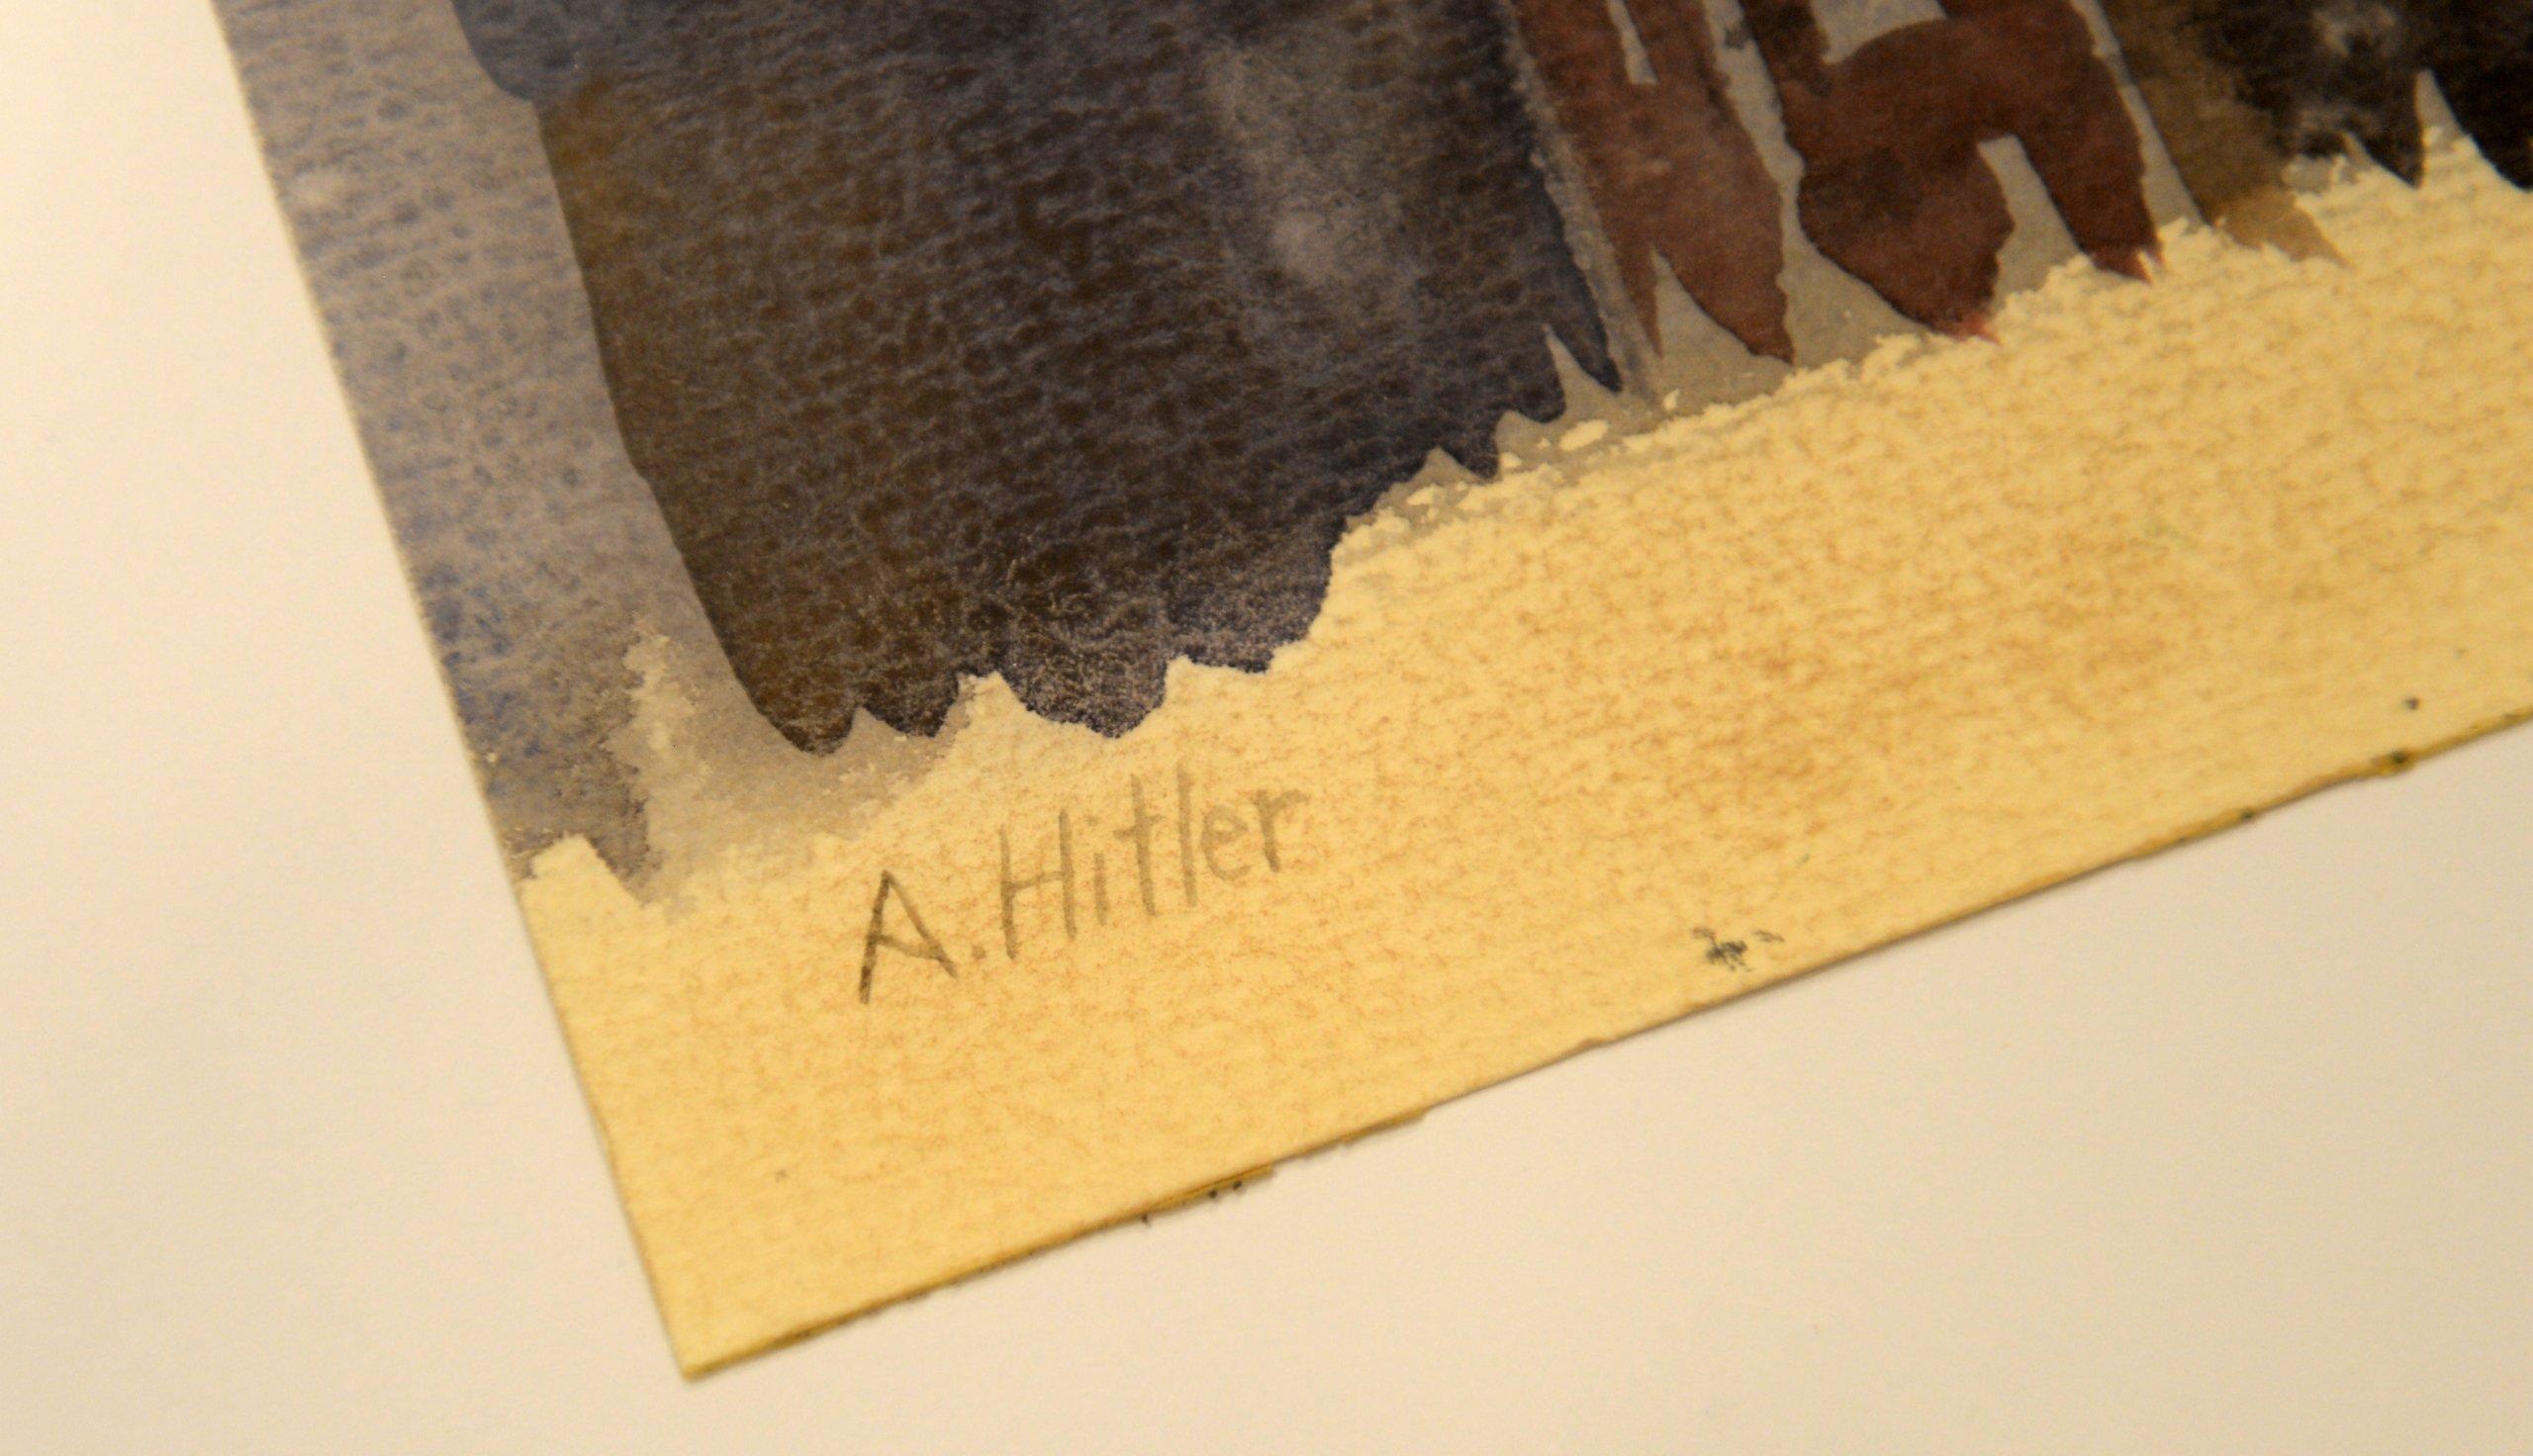 GERMANY-HISTORY-ART-AUCTION